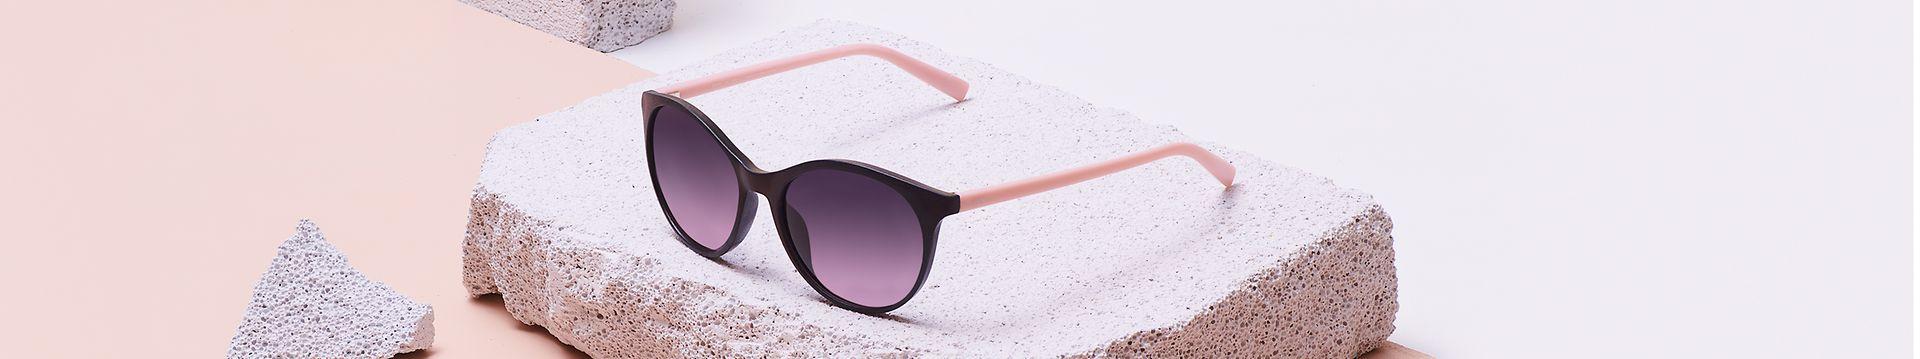 112021 - Women - tc banner - Sunglasses (1)